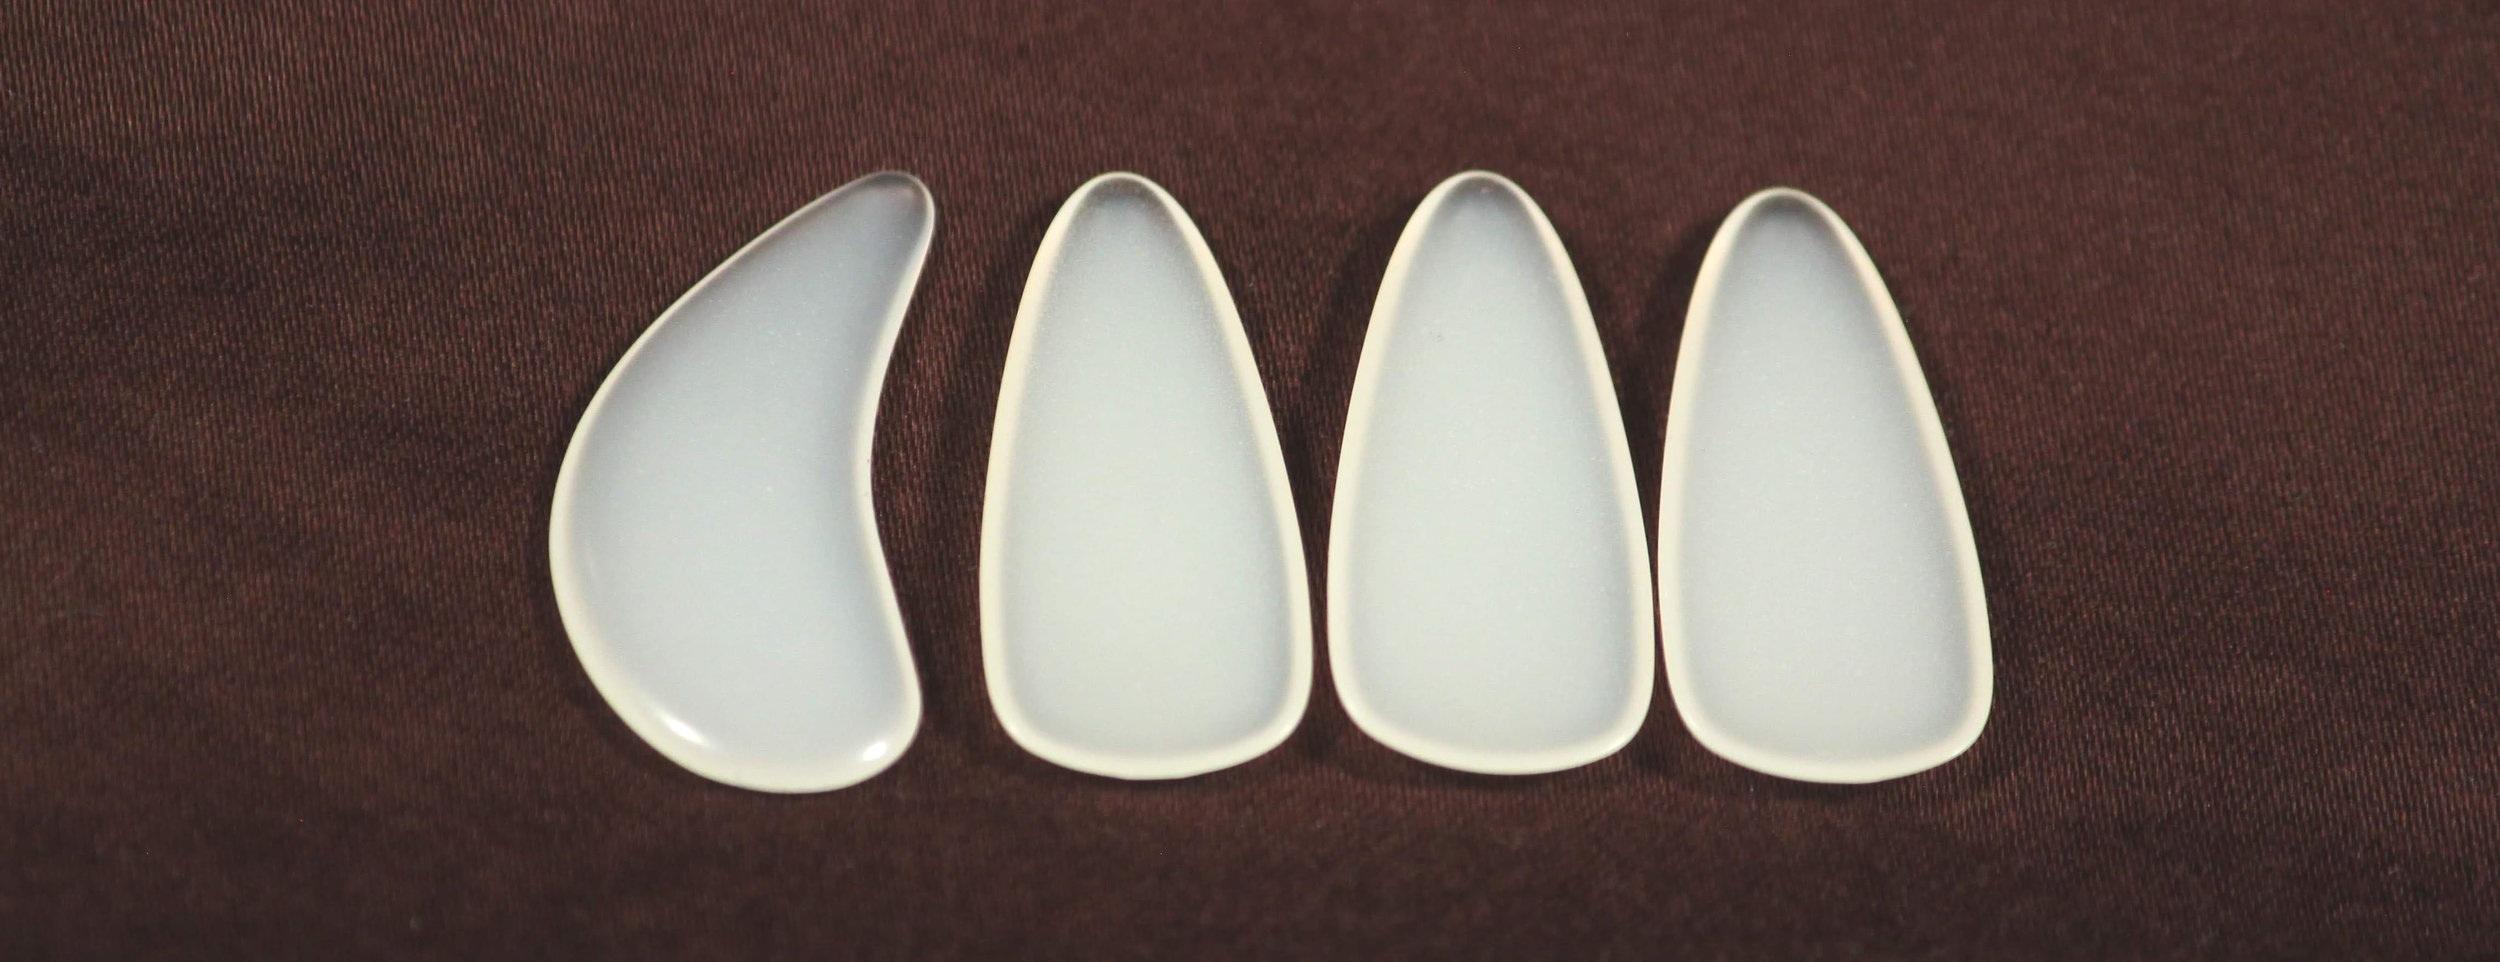 Nylon guzheng nails.